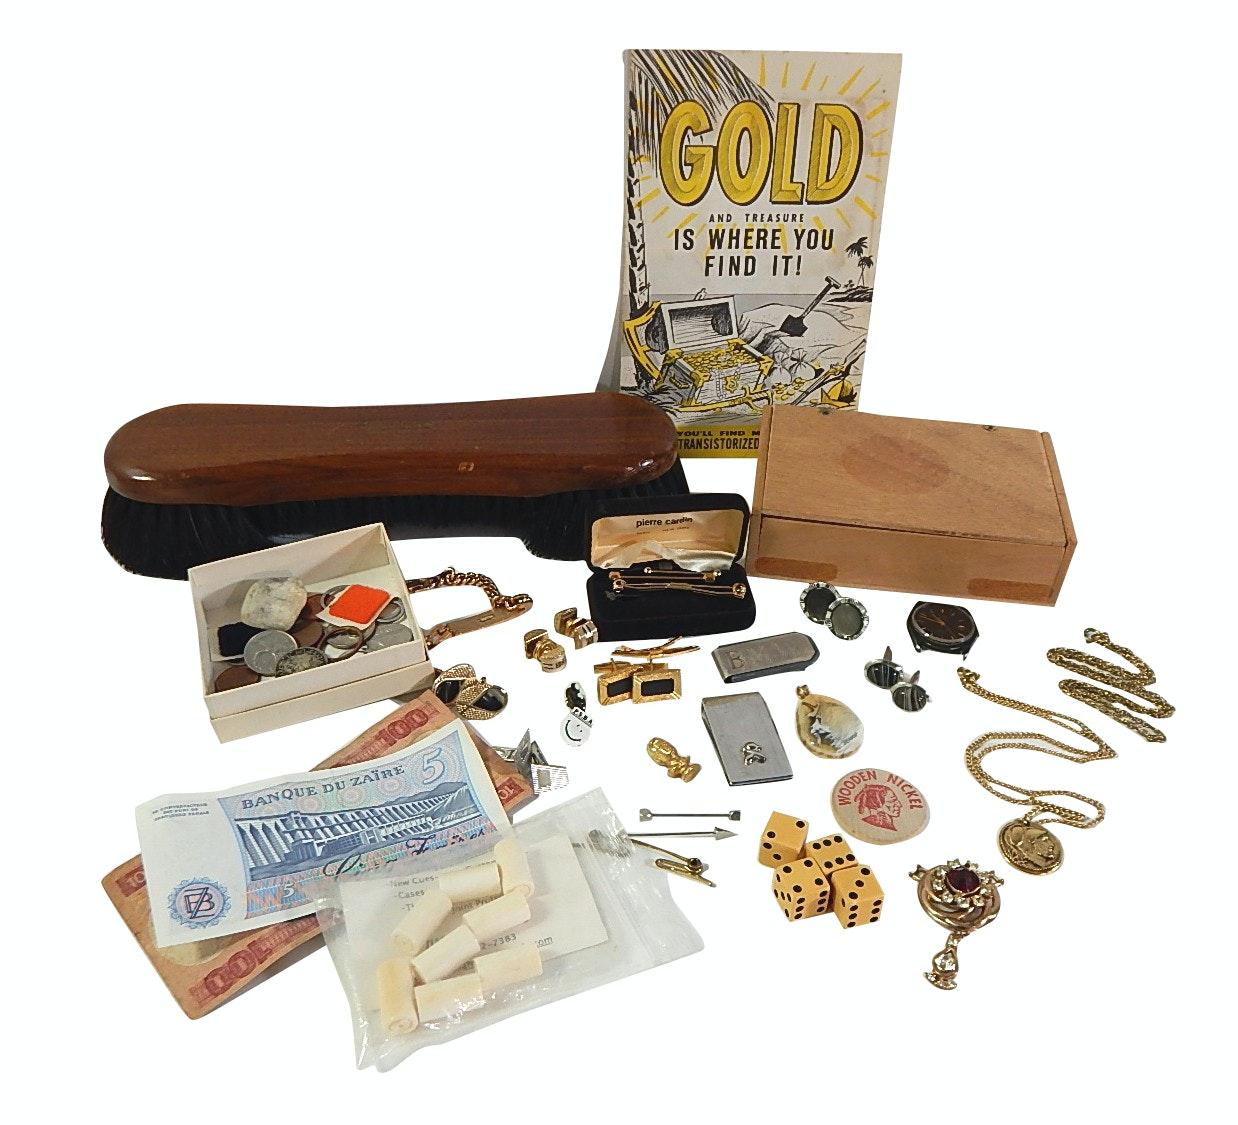 Foreign Currency, Medals, Cufflinks, Billiard Brush, Wood Box, Trinkets